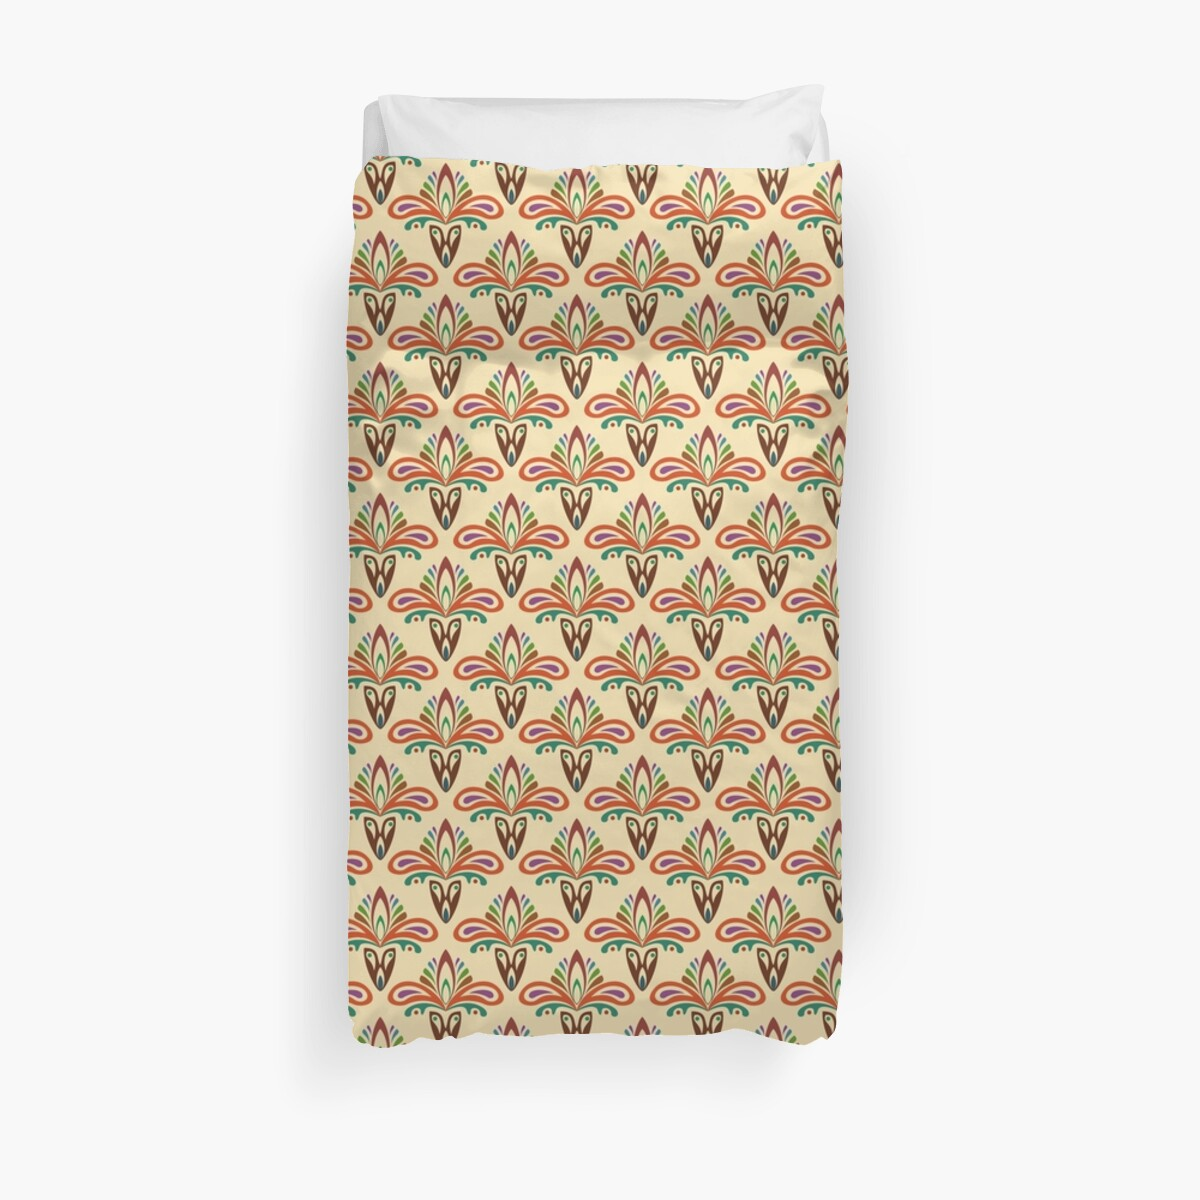 Abstract tribal damask pattern by mrhighsky